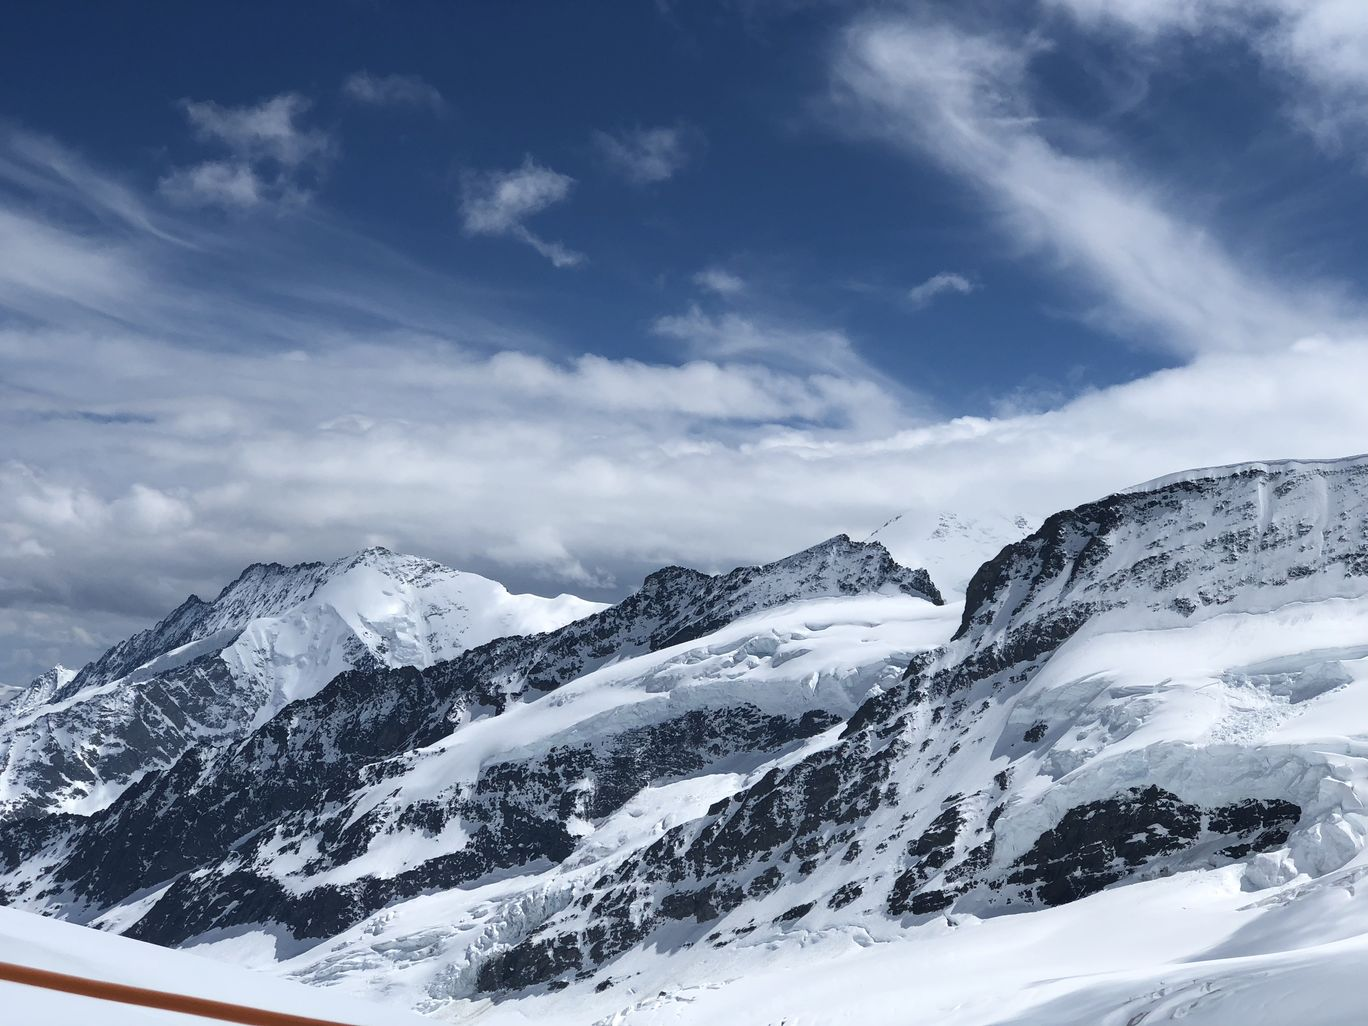 Photo of Jungfrau By Tanvi